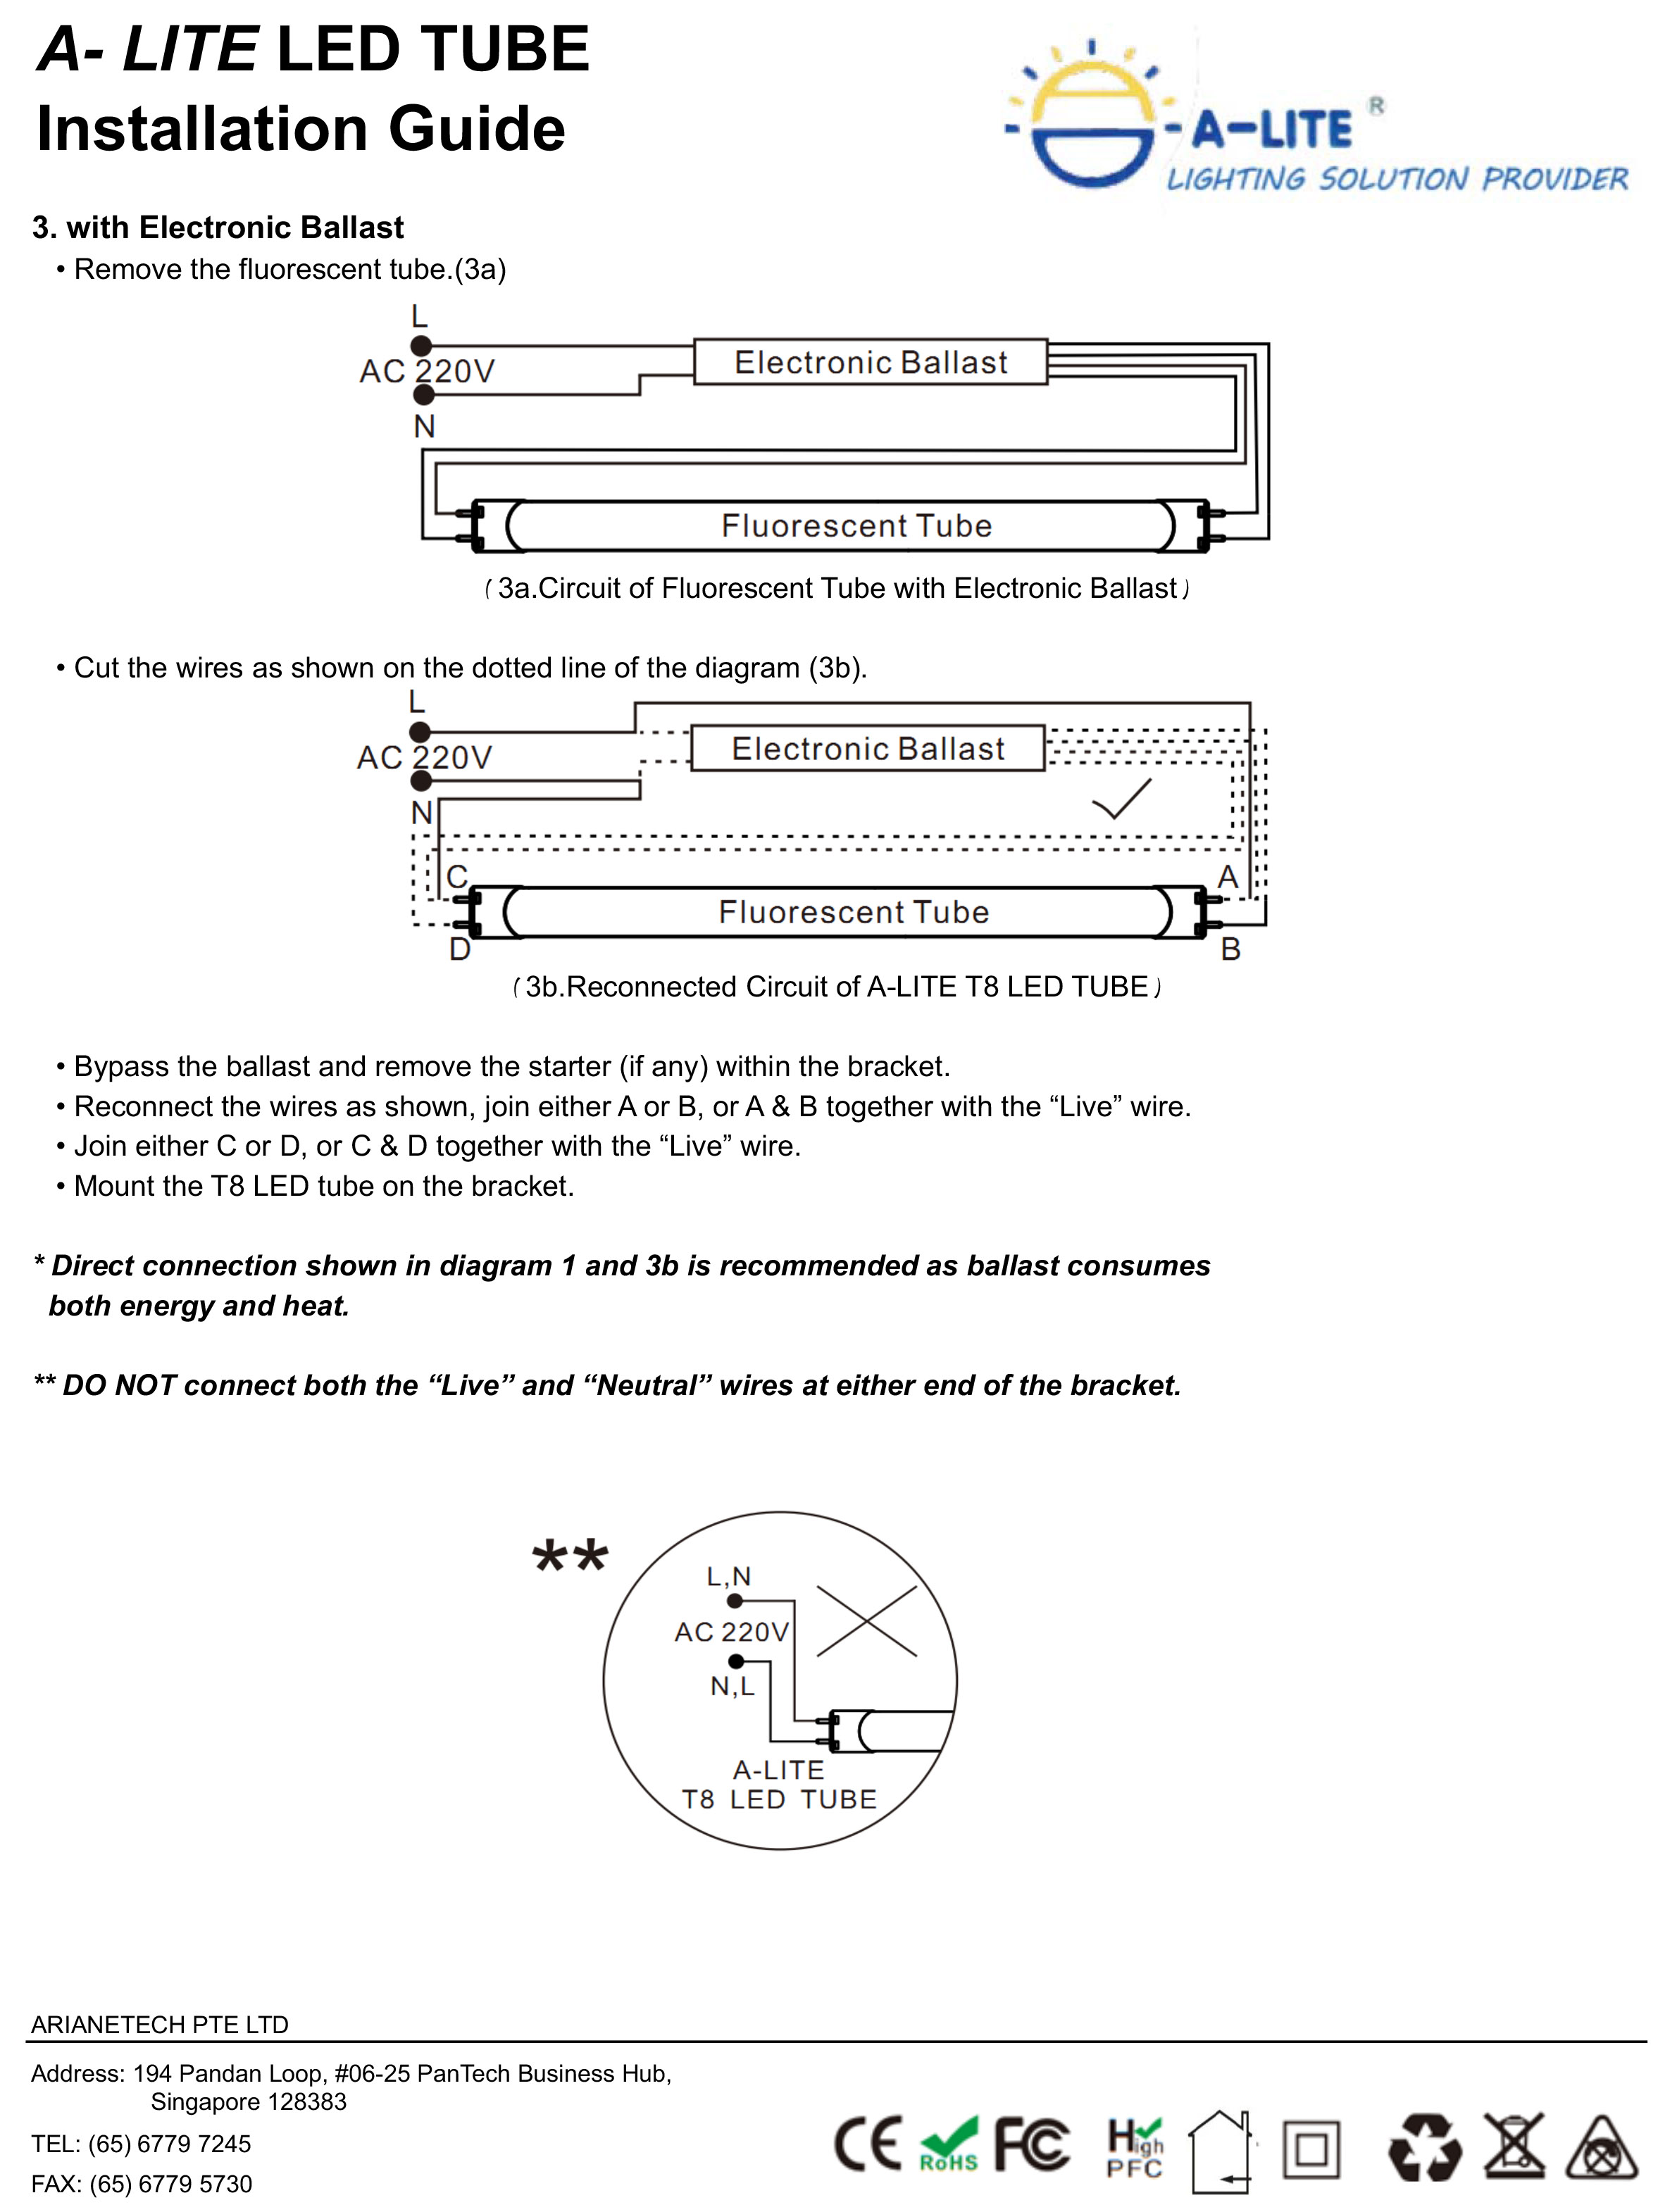 Led Tube Light Classic Series T8 18w 4 Feet 2 Foot Bulb Driver Wiring Diagram